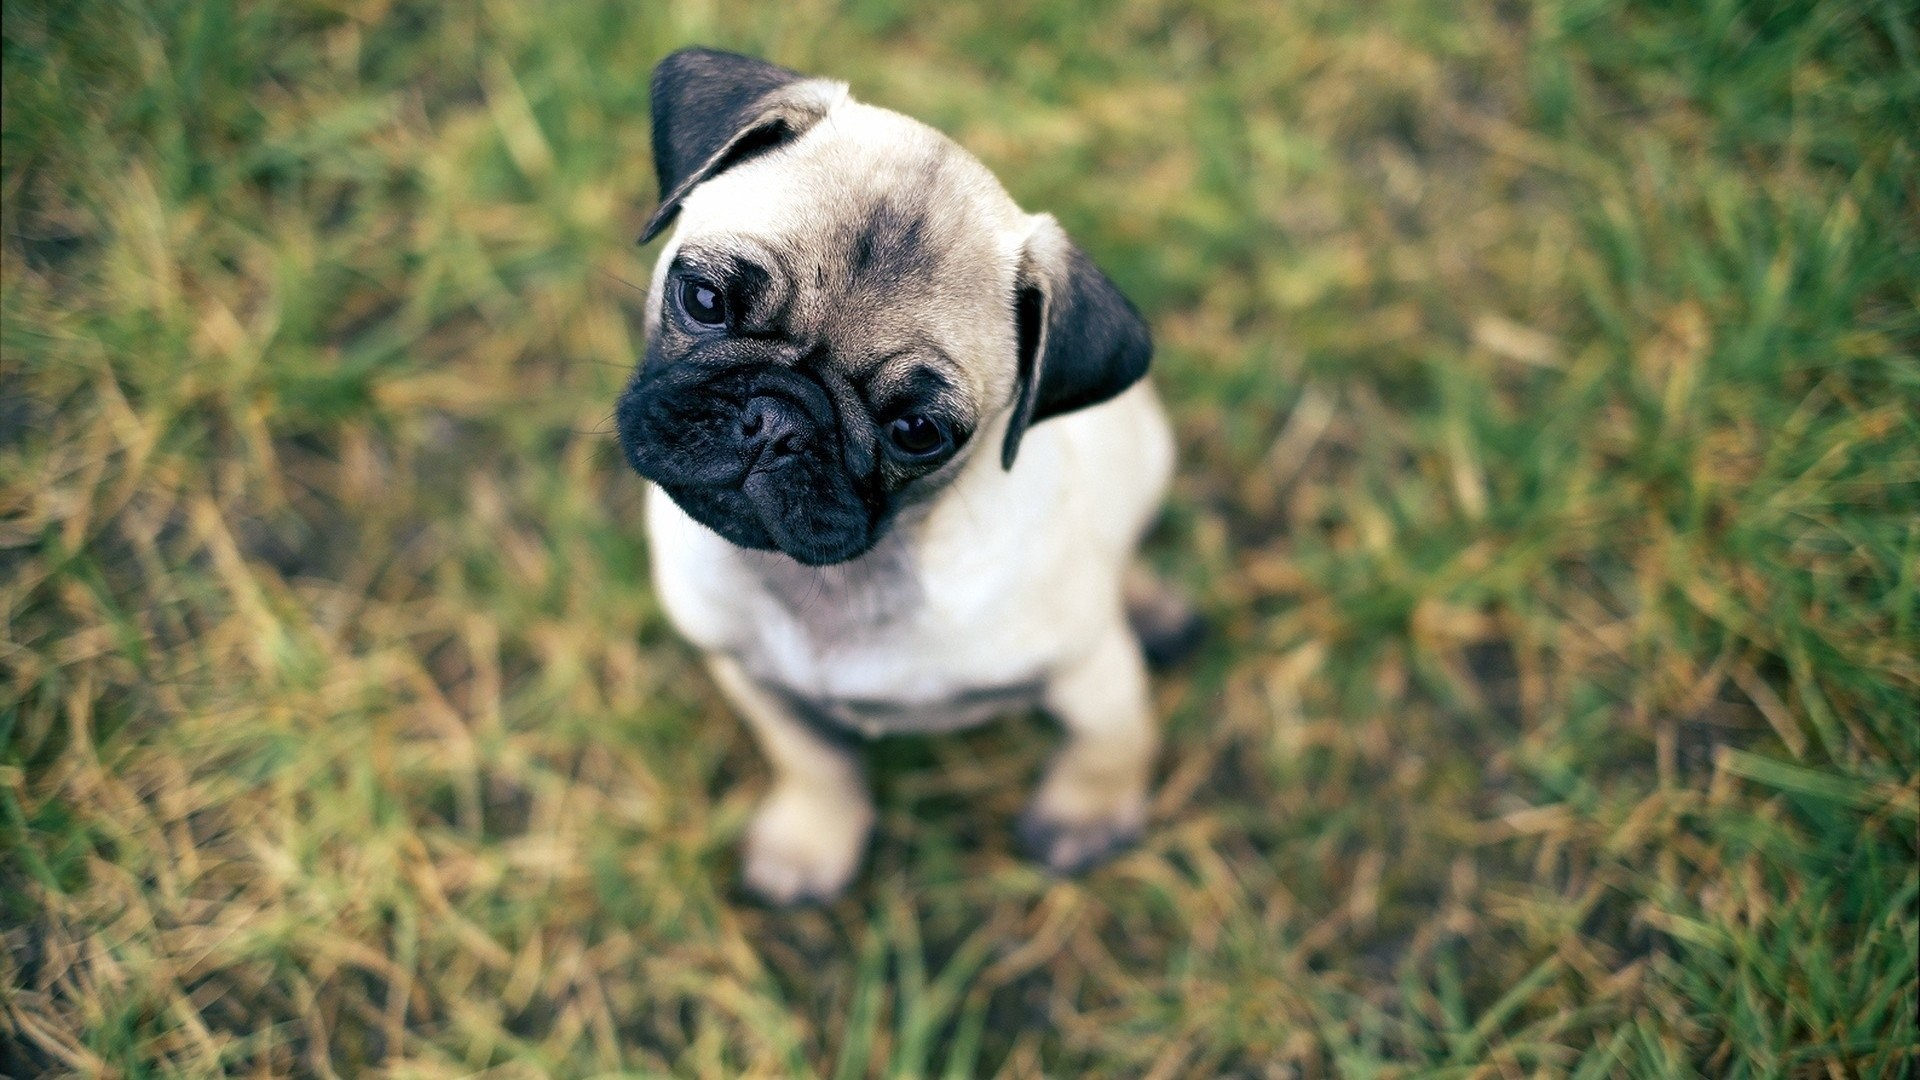 Pug Dog Wallpaper Iphone Hd Gambarku